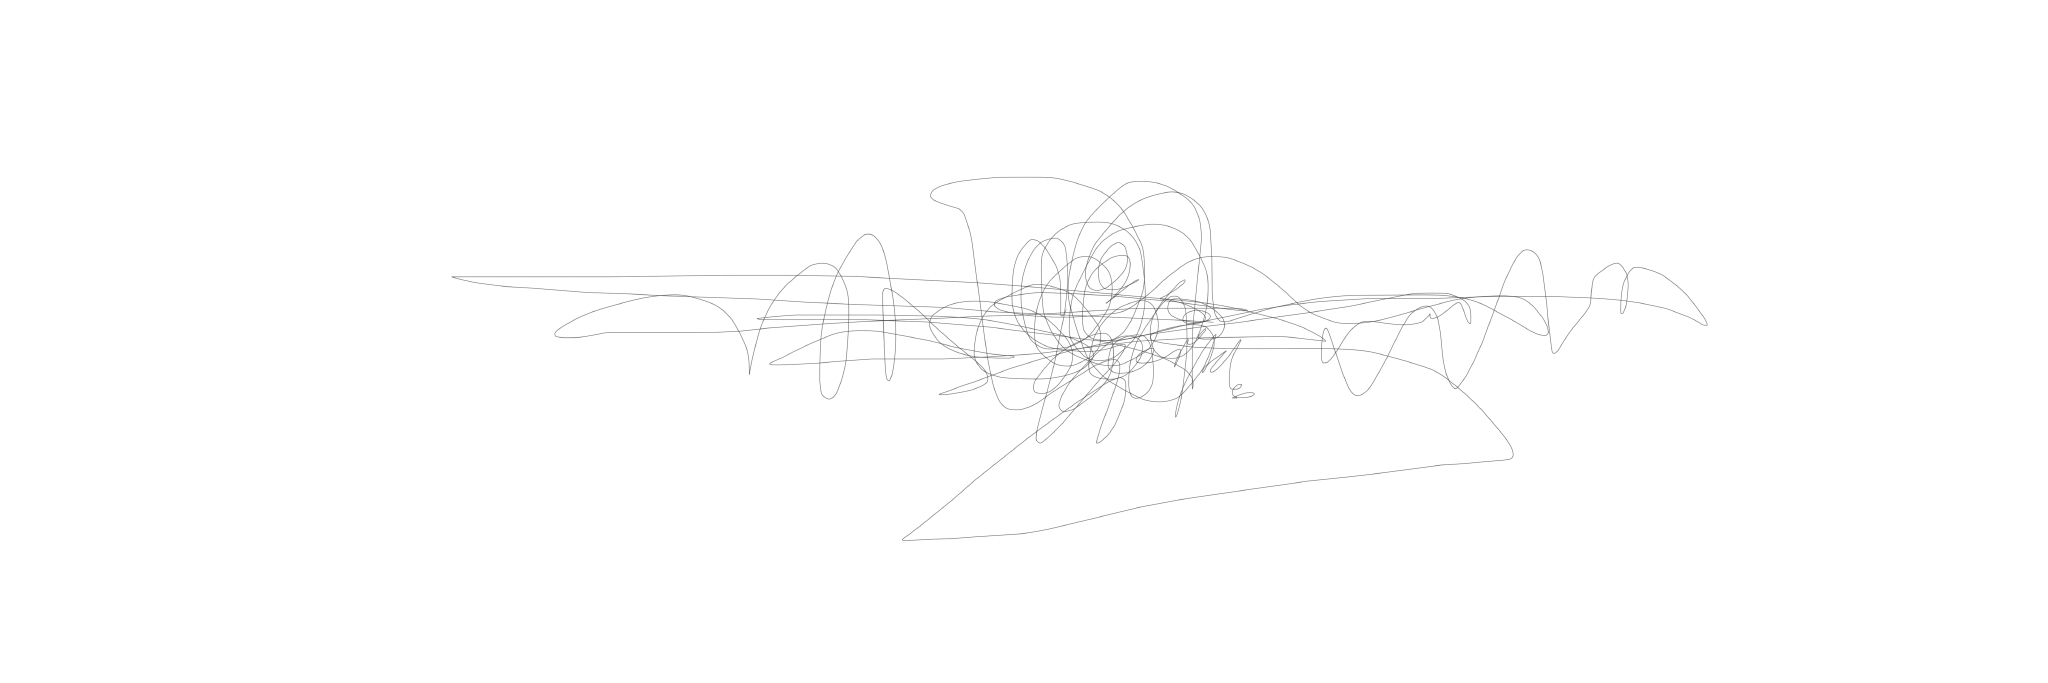 san diego wedding   photographer | sketch of scribbles